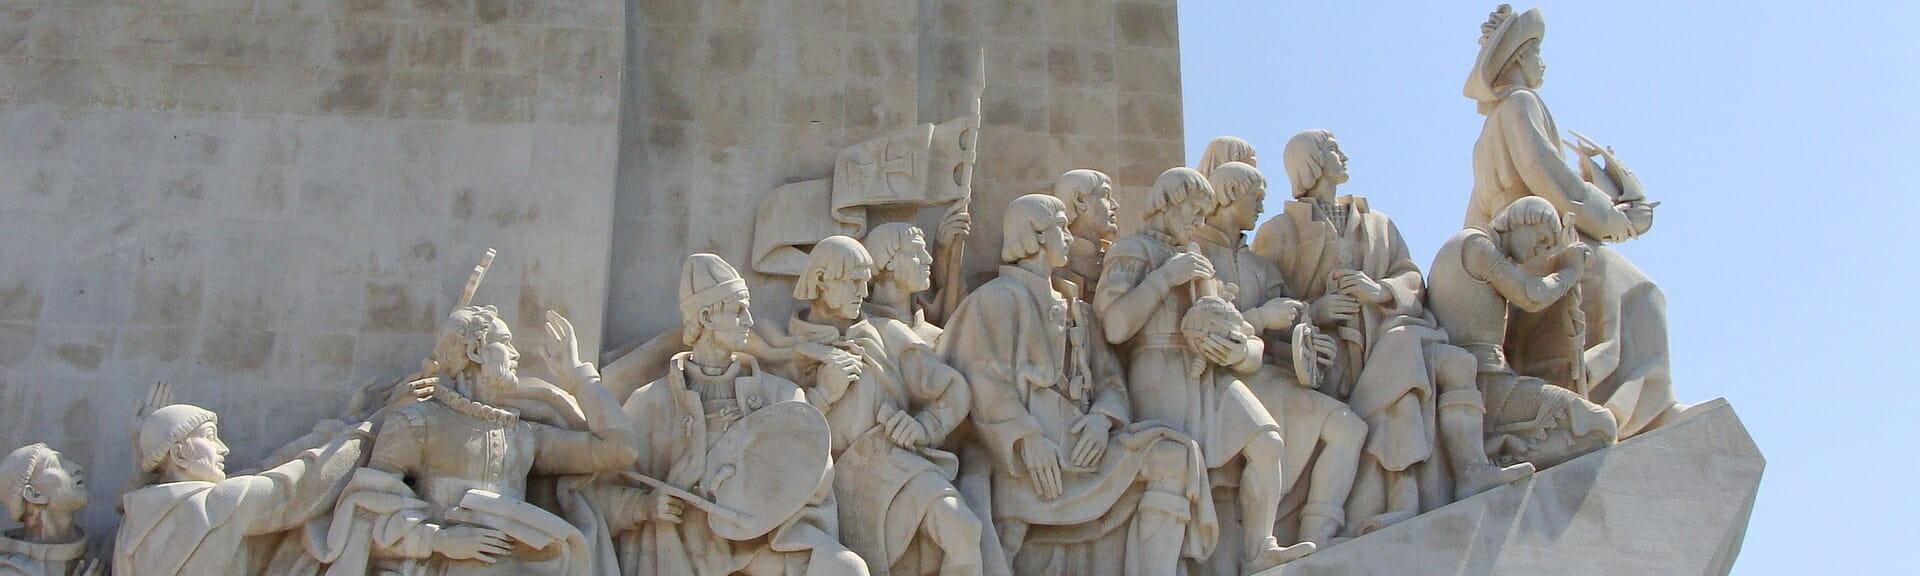 Klassenfahrt Lissabon Entdeckerdenkmal Padrao dos Descobrimentos 2